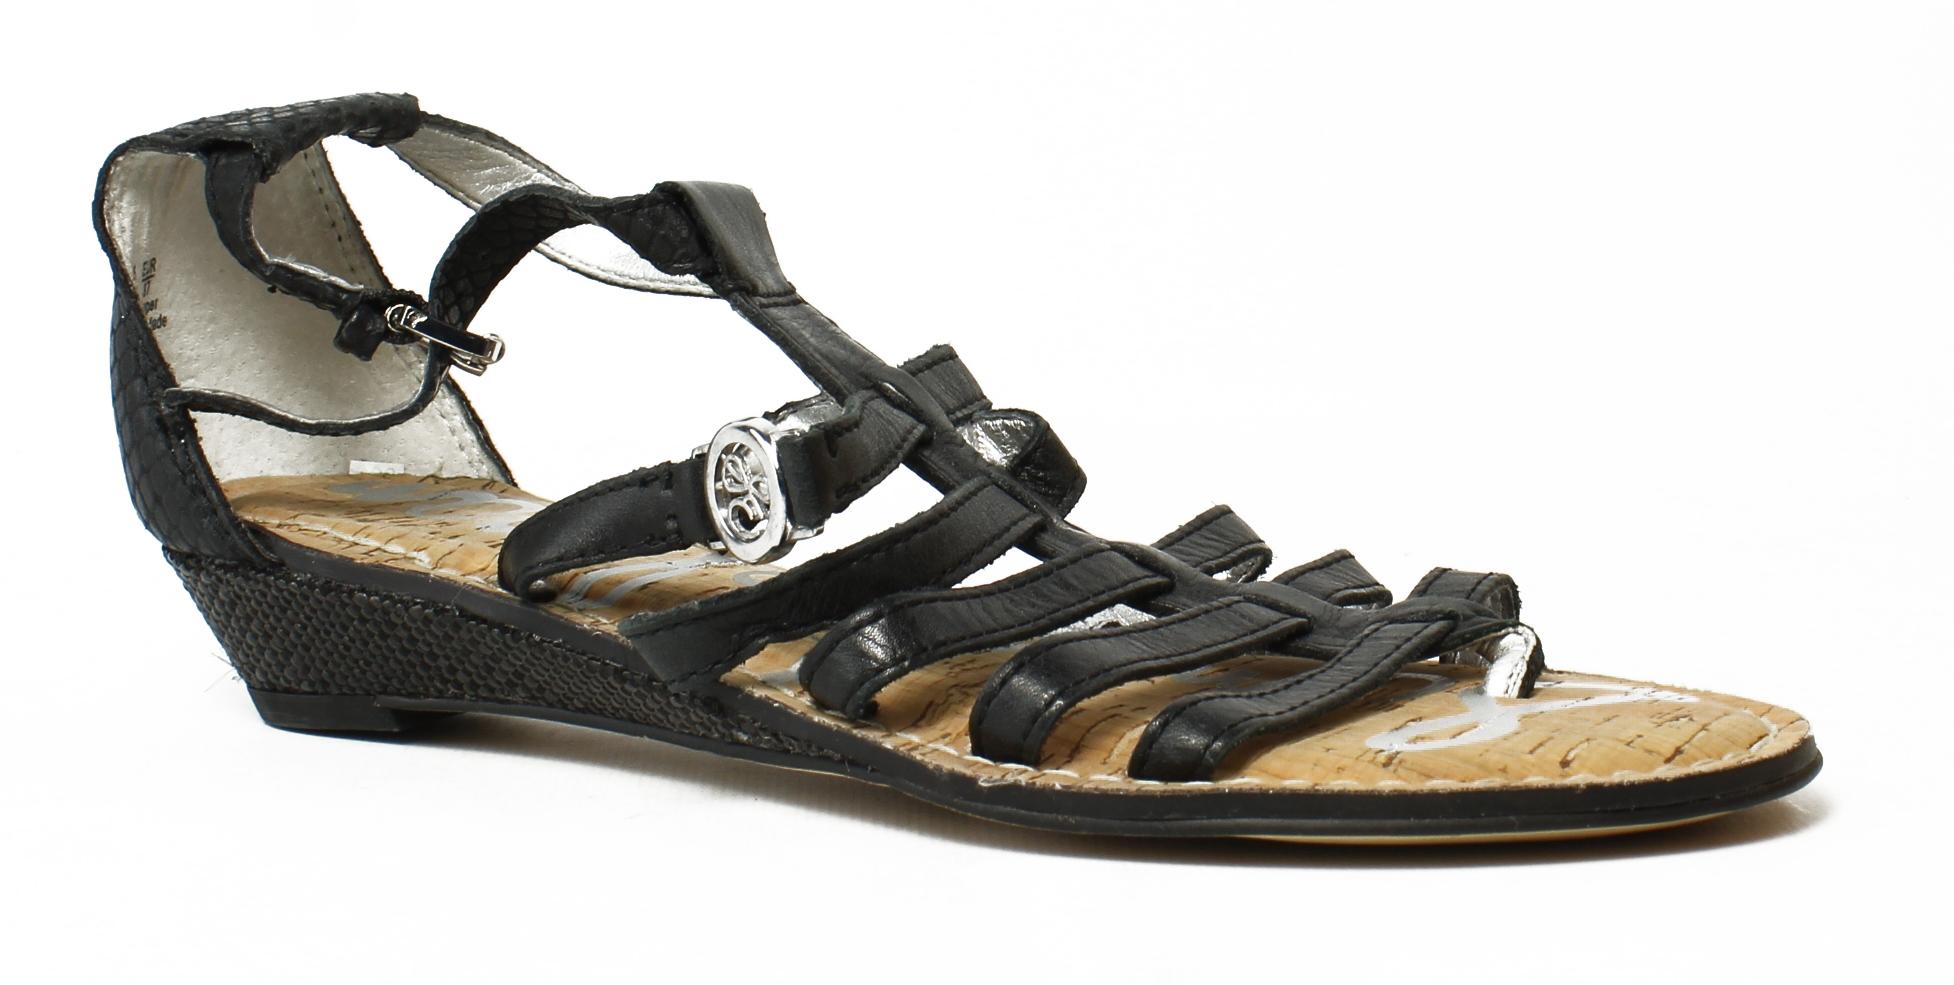 90462ce1ac26 Sam Edelman Womens Black Ankle Strap Sandals Size 6.5 (333256)